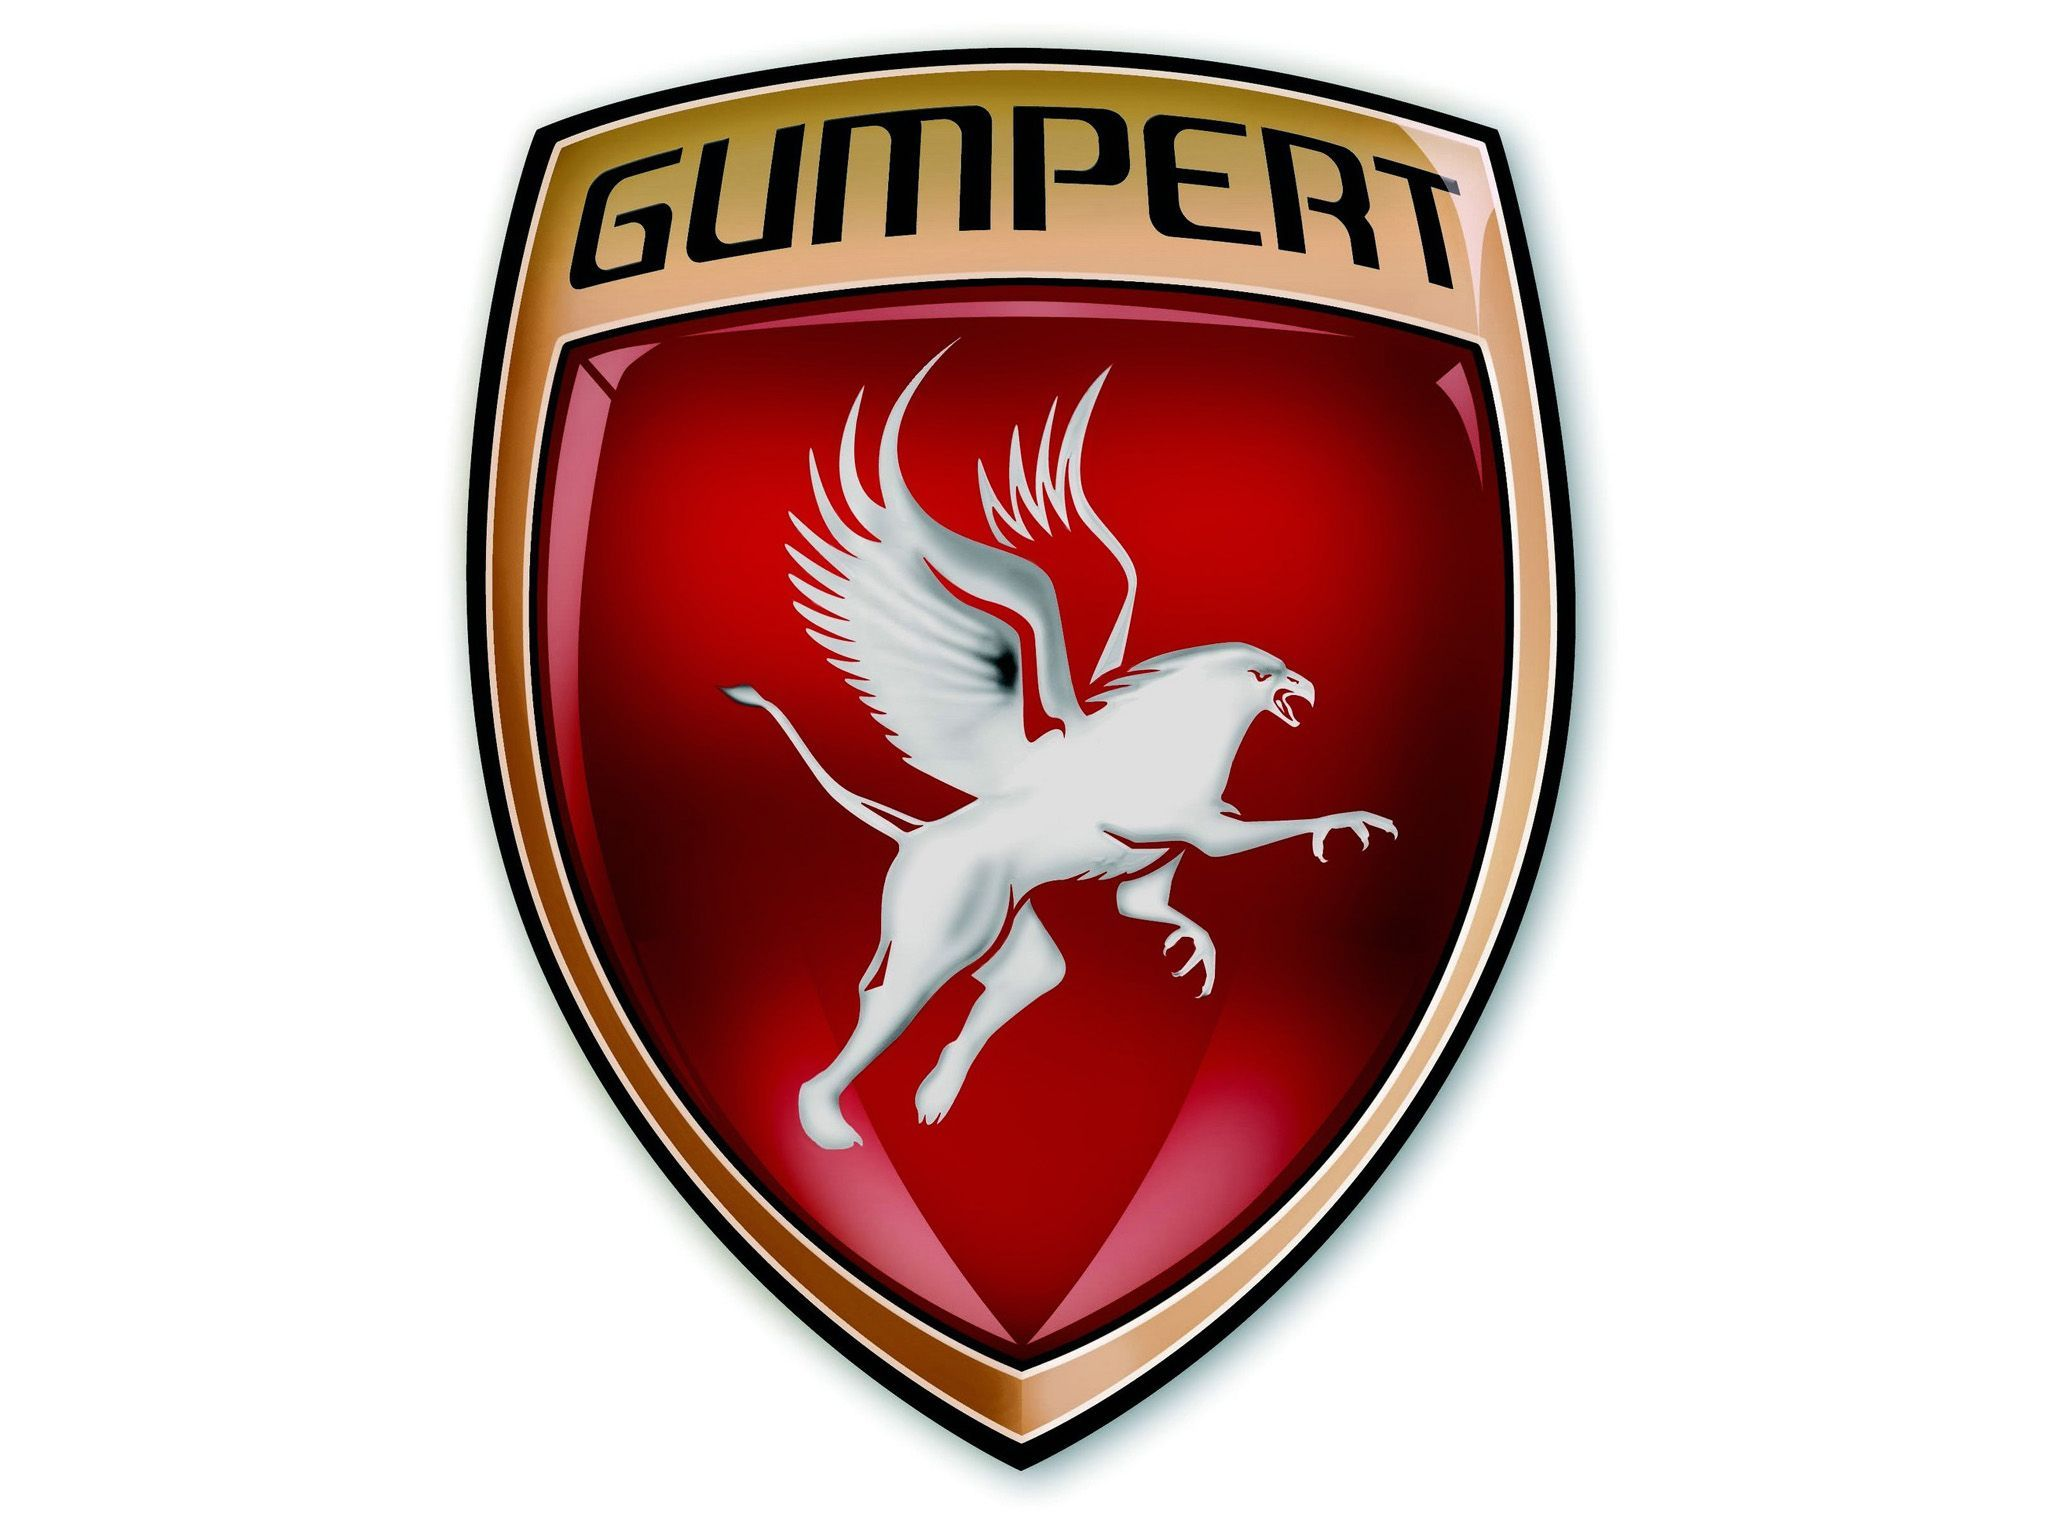 Gumpert logo Car logos, Car brands logos, Car brands